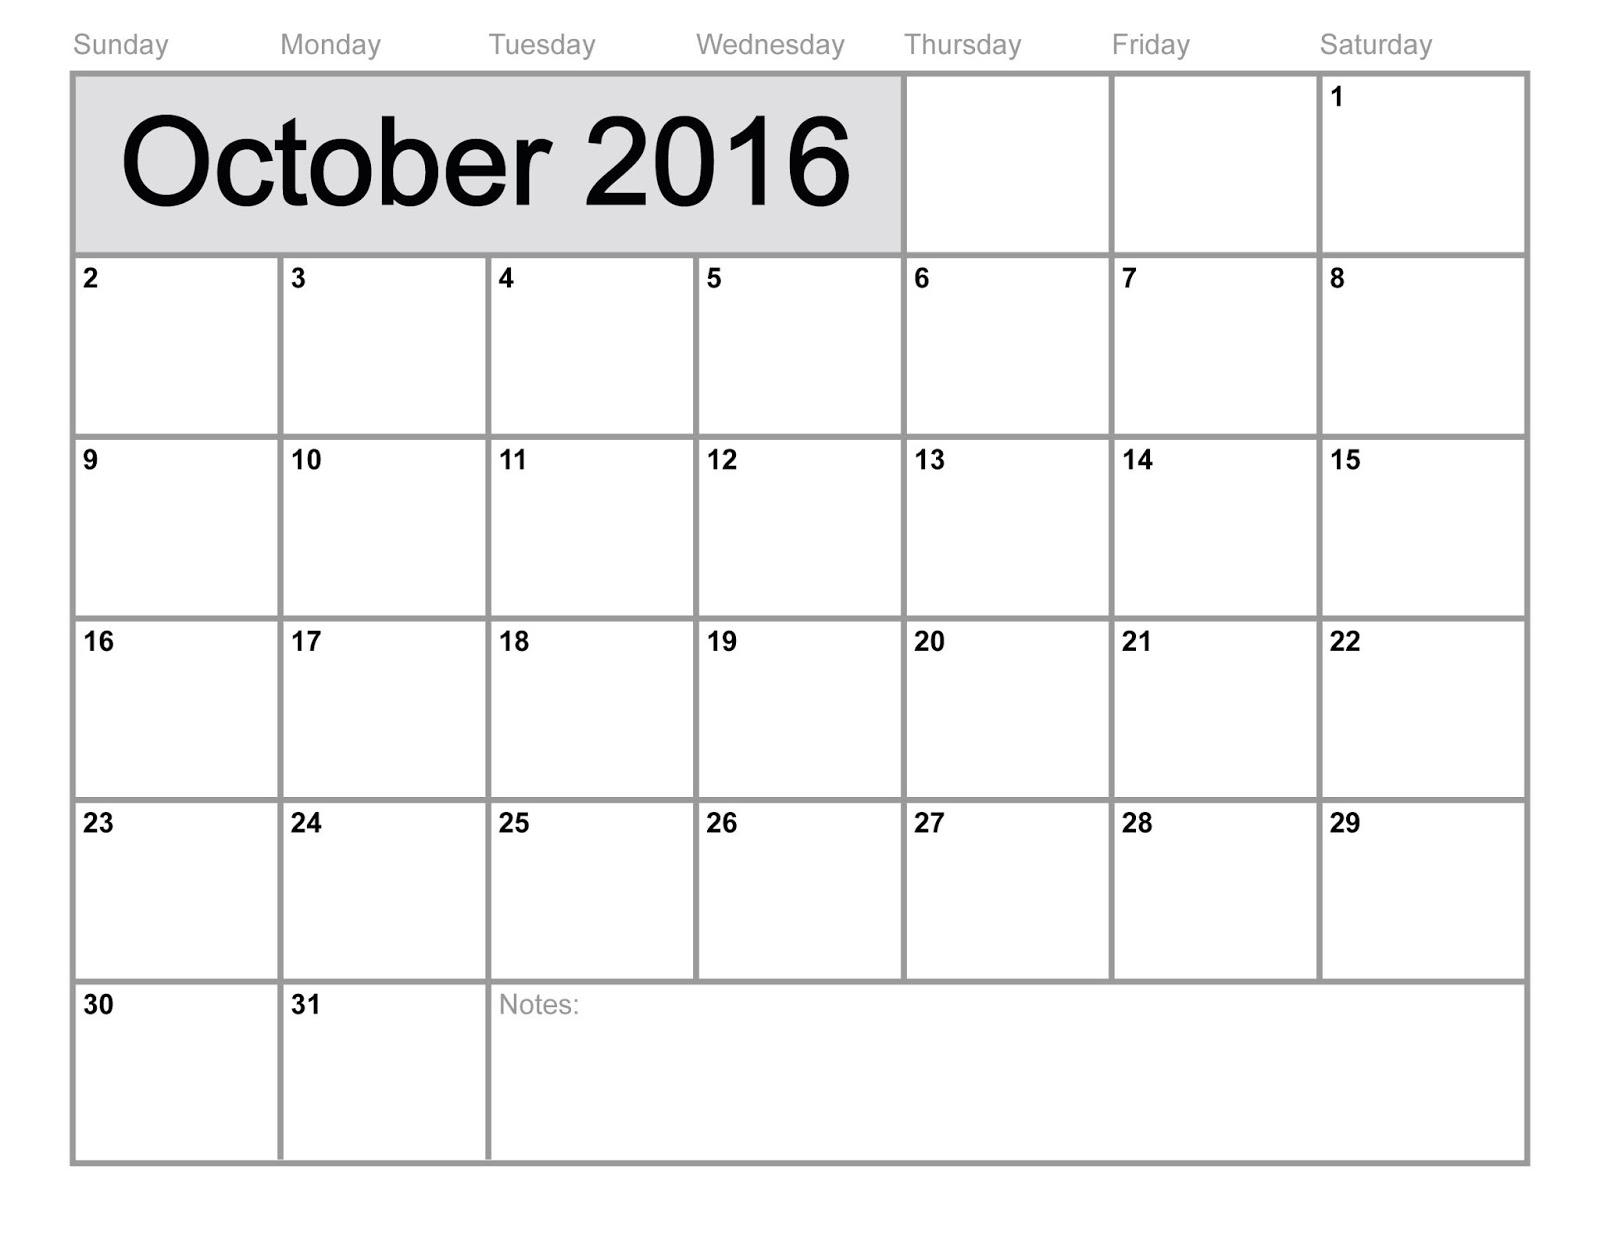 Free Printable Calendar 2016 | Blank Calendar: October 2016 Blank